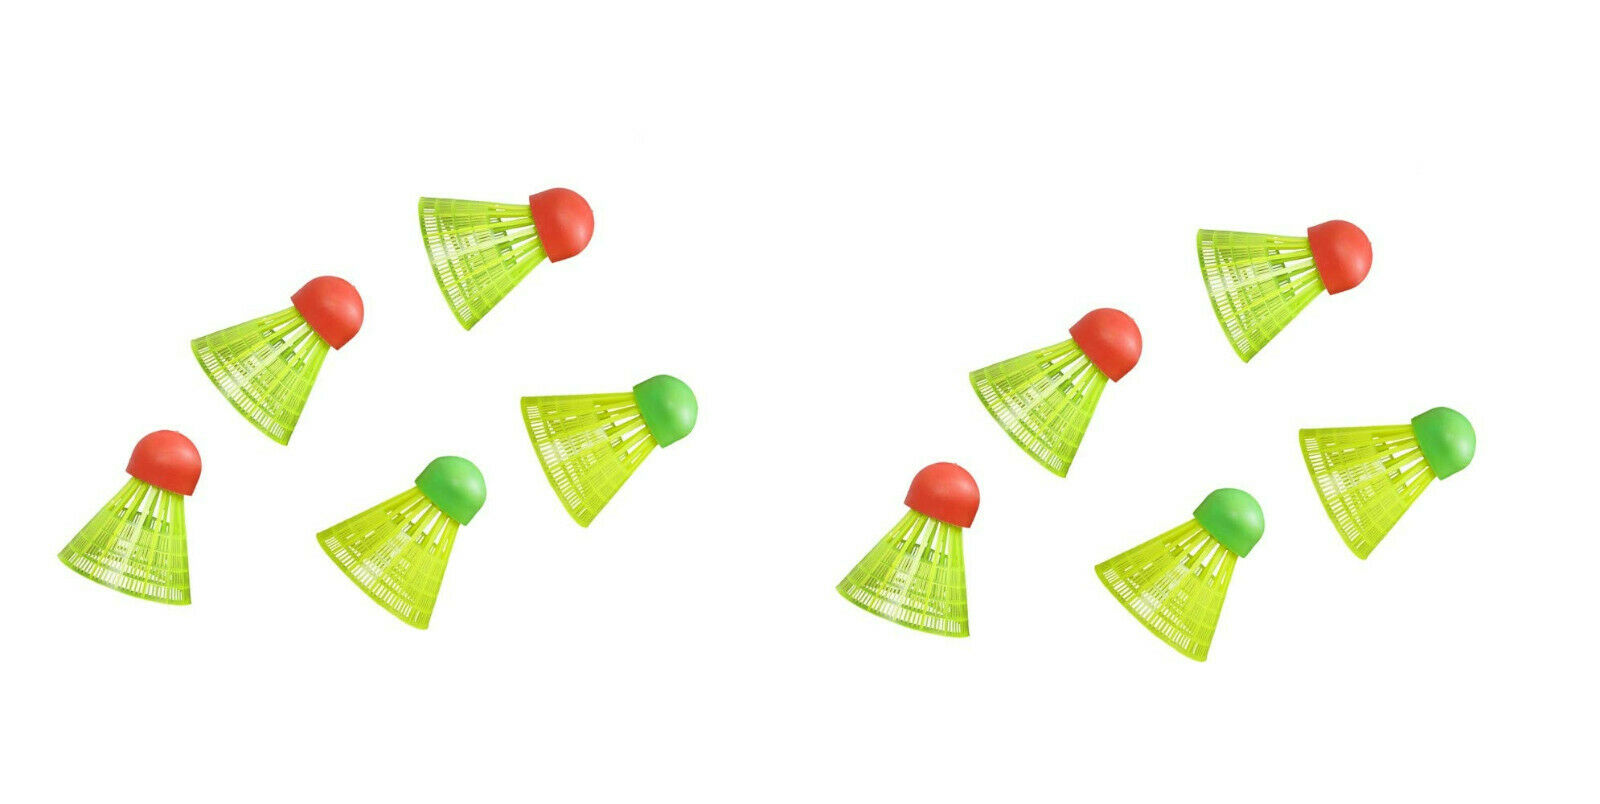 10x HUDORA Badminton Ersatzbälle Badmintonbälle 26- 2652